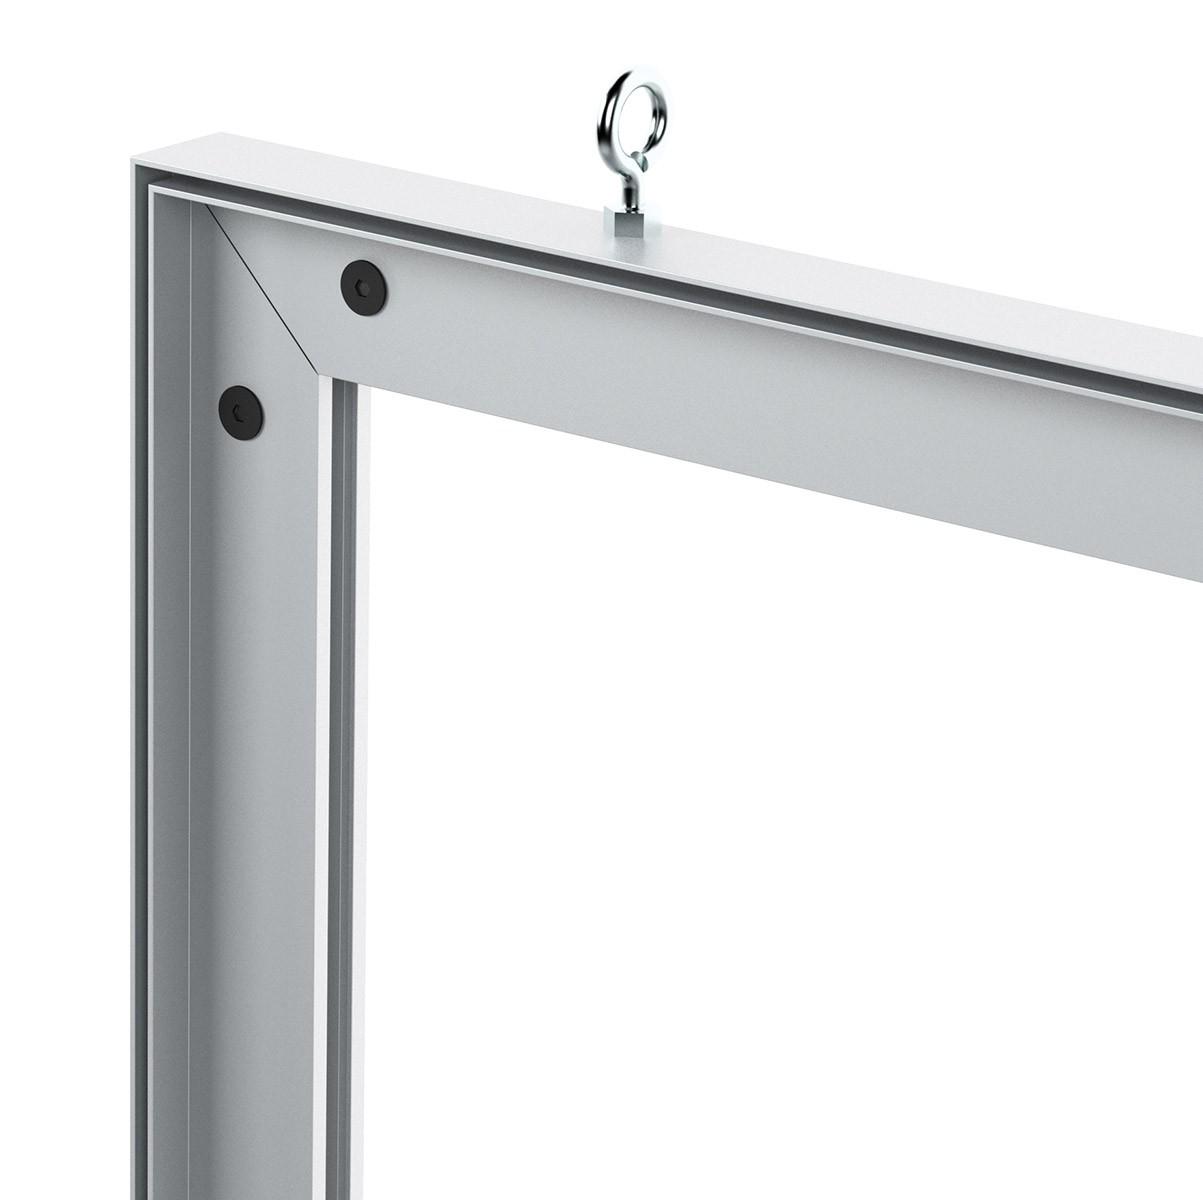 Charisma 36x48 Double Sided SEG Fabric Frame | Power-Graphics.com